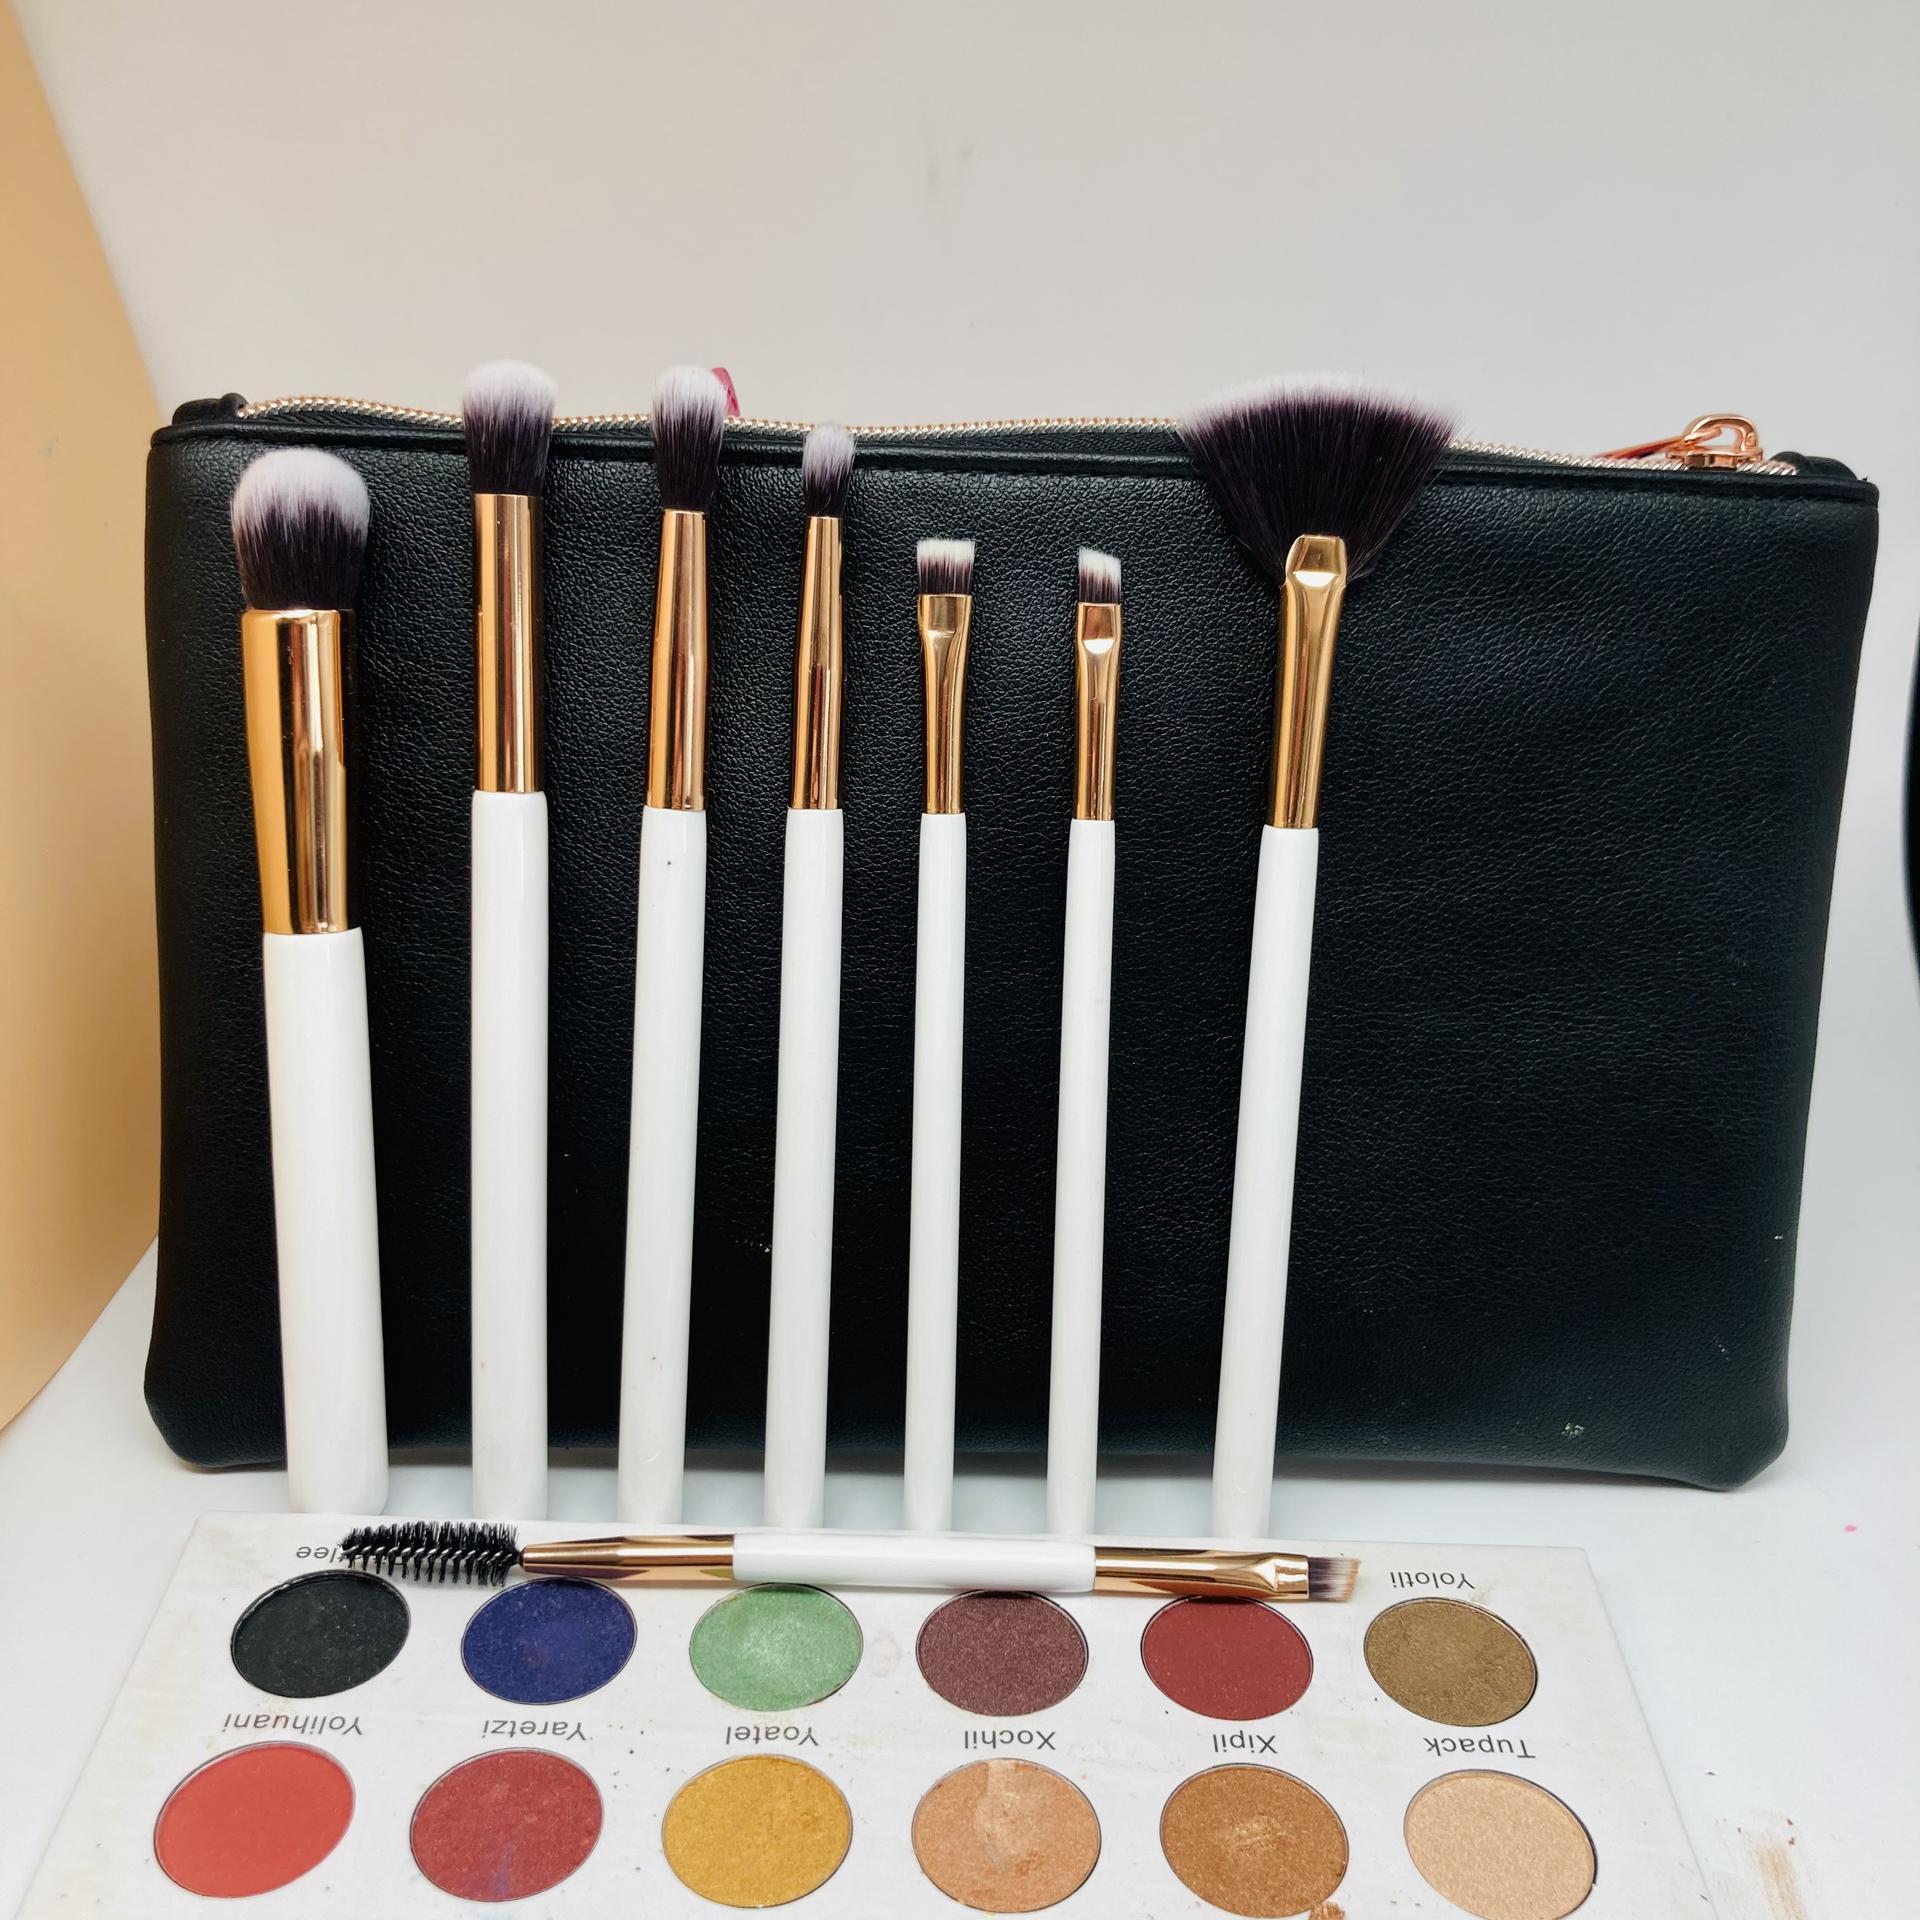 Eyeshadow makeup brush Suprabeauty blending brushes private label eye brush set